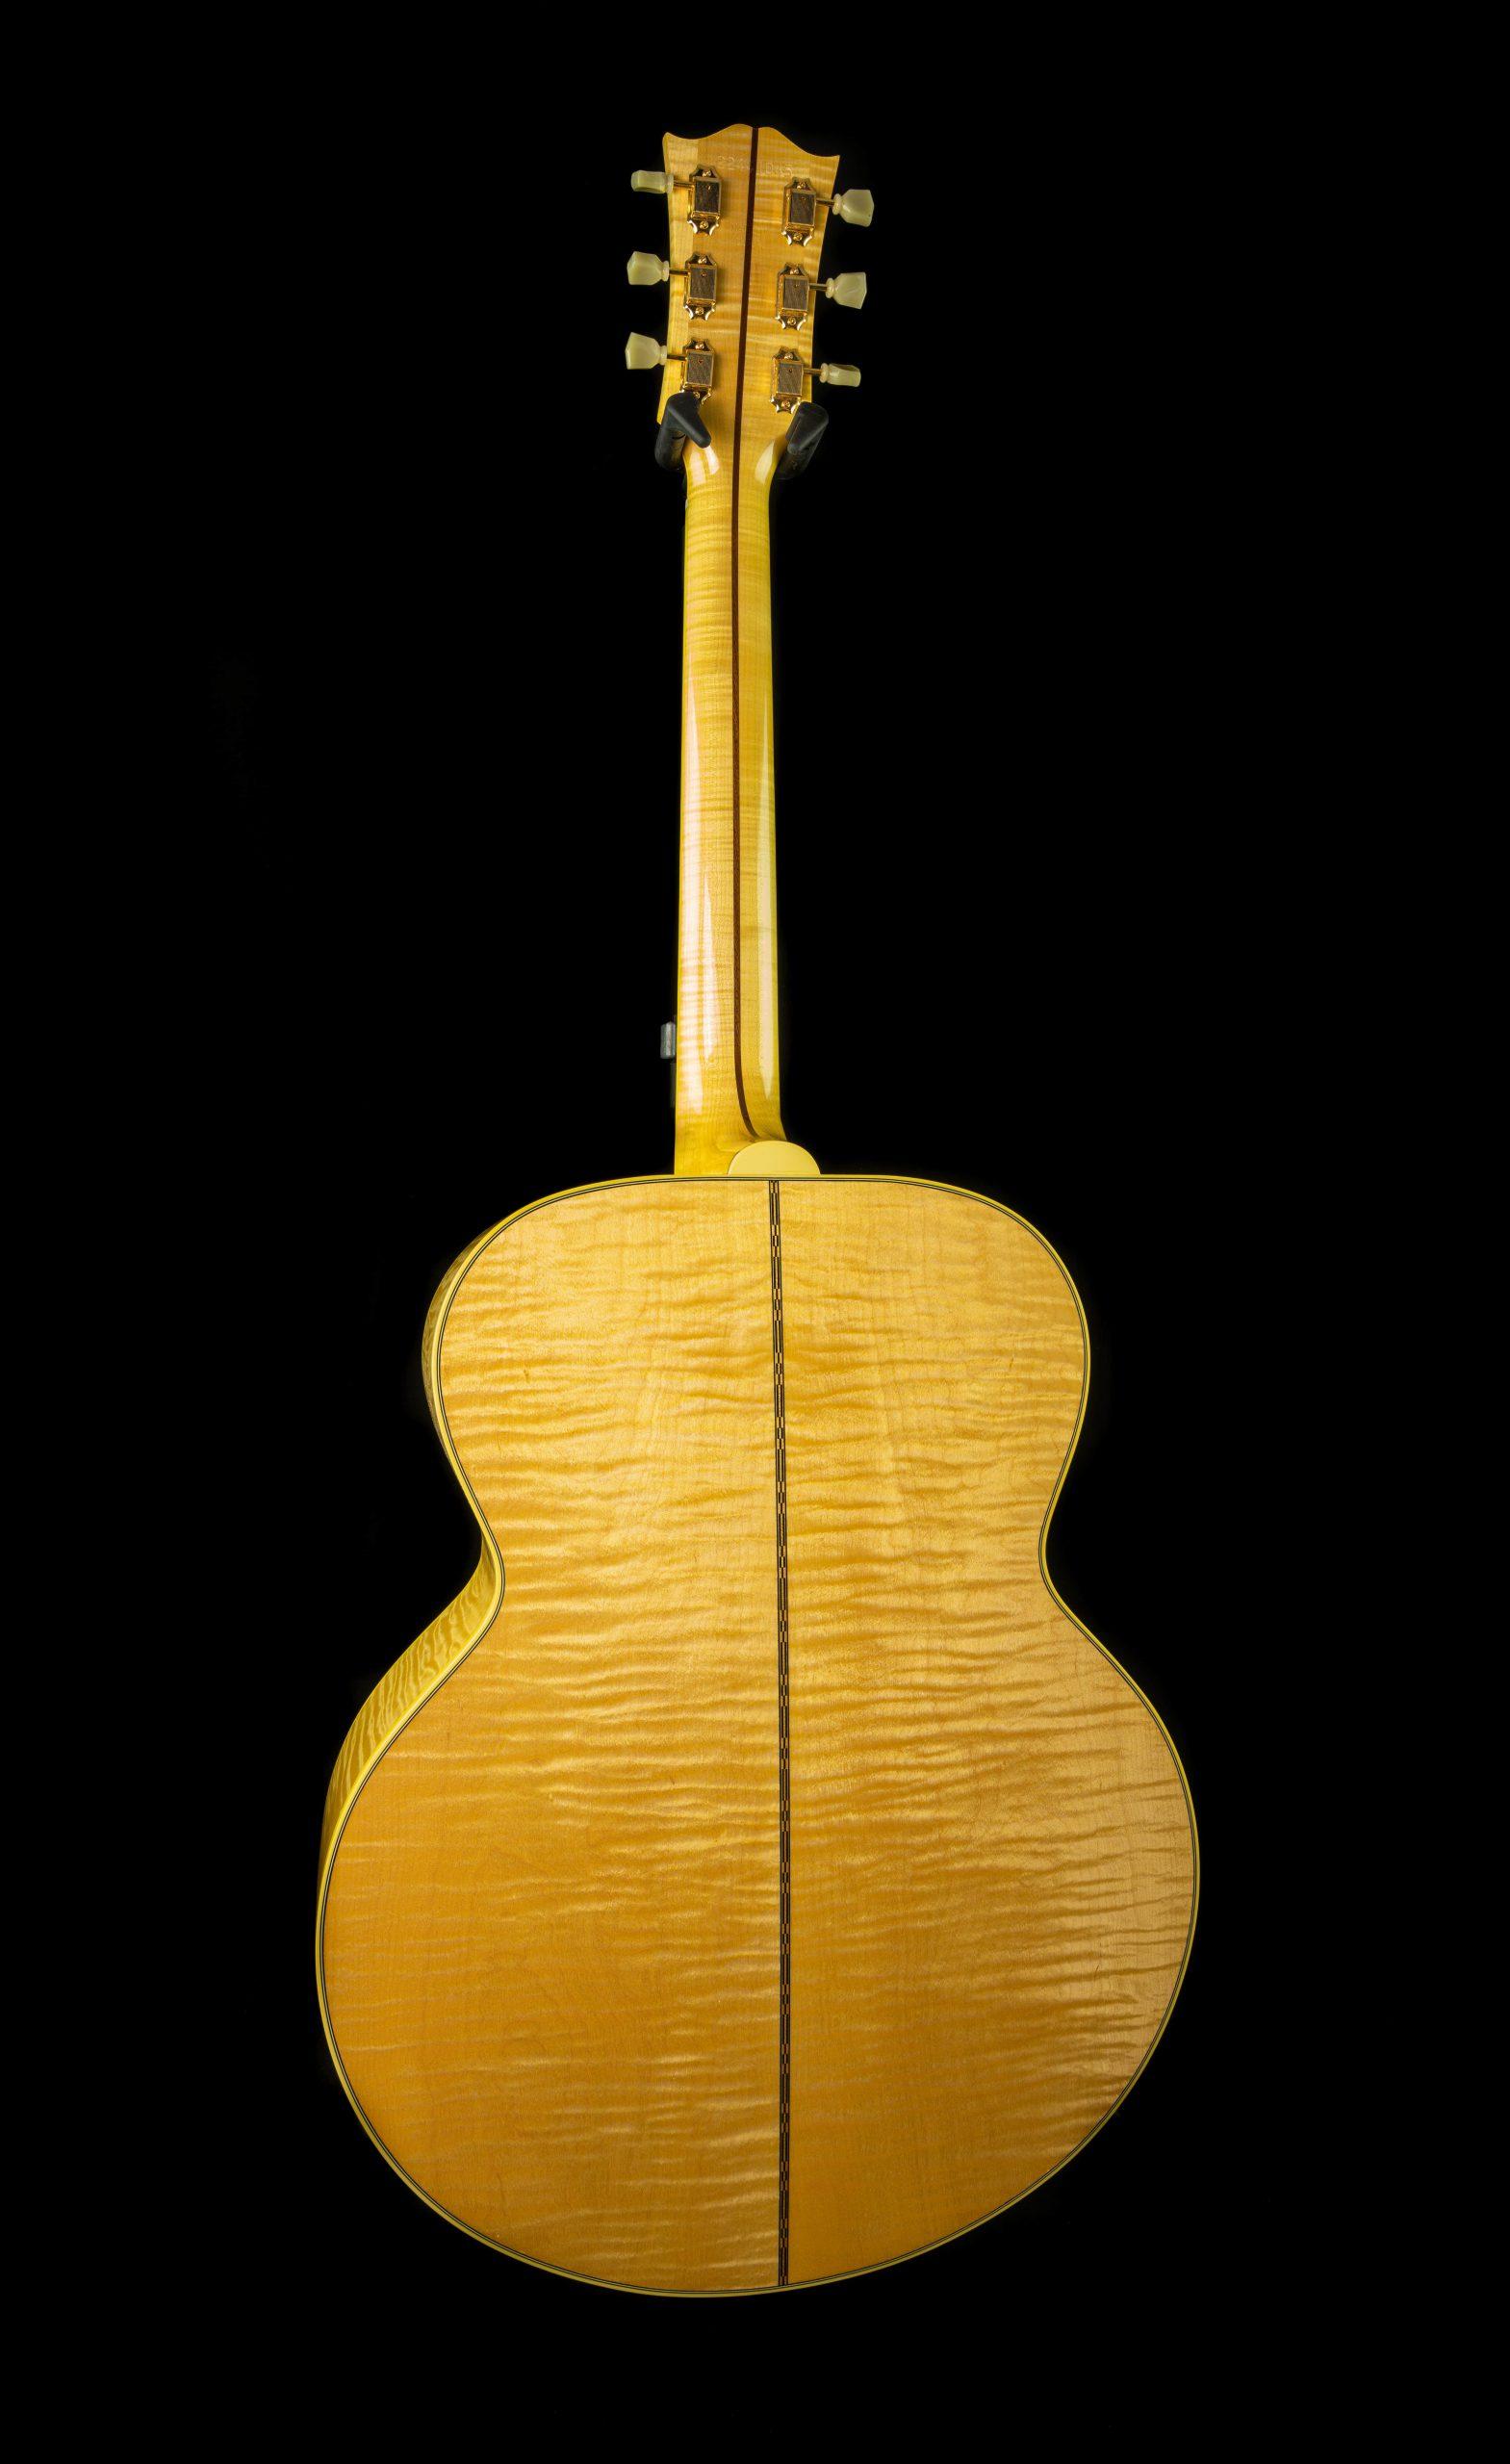 Gibson - Original Collection - SJ-200 in Antique Natural